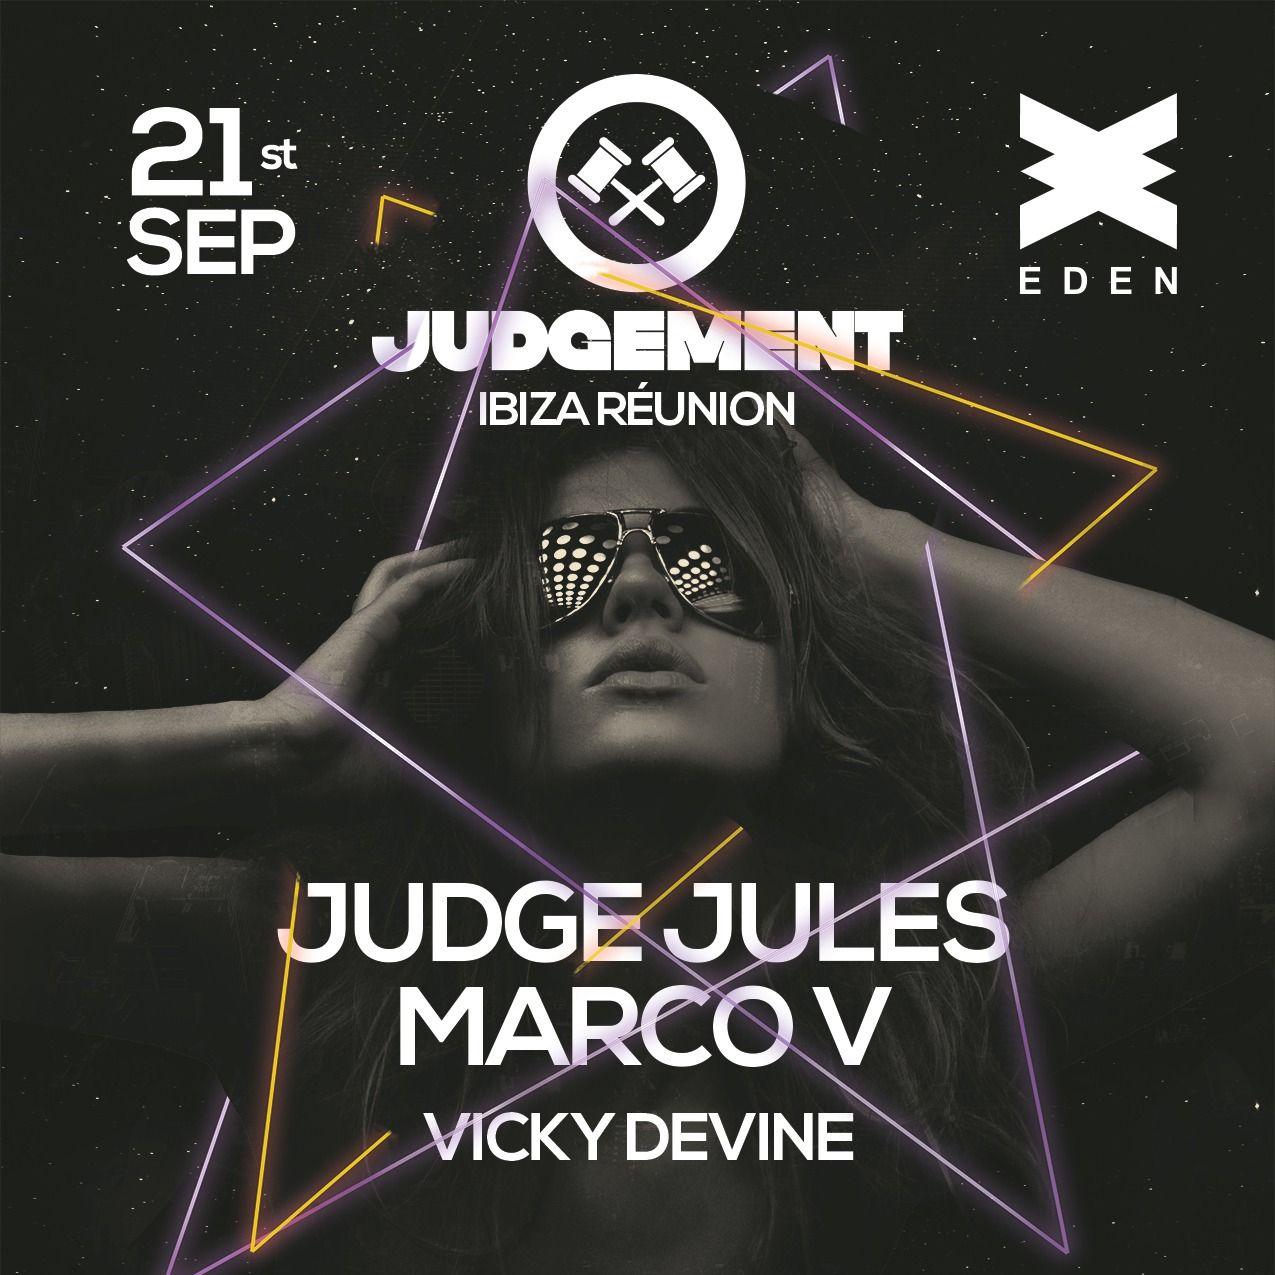 judgement_artwork.jpg